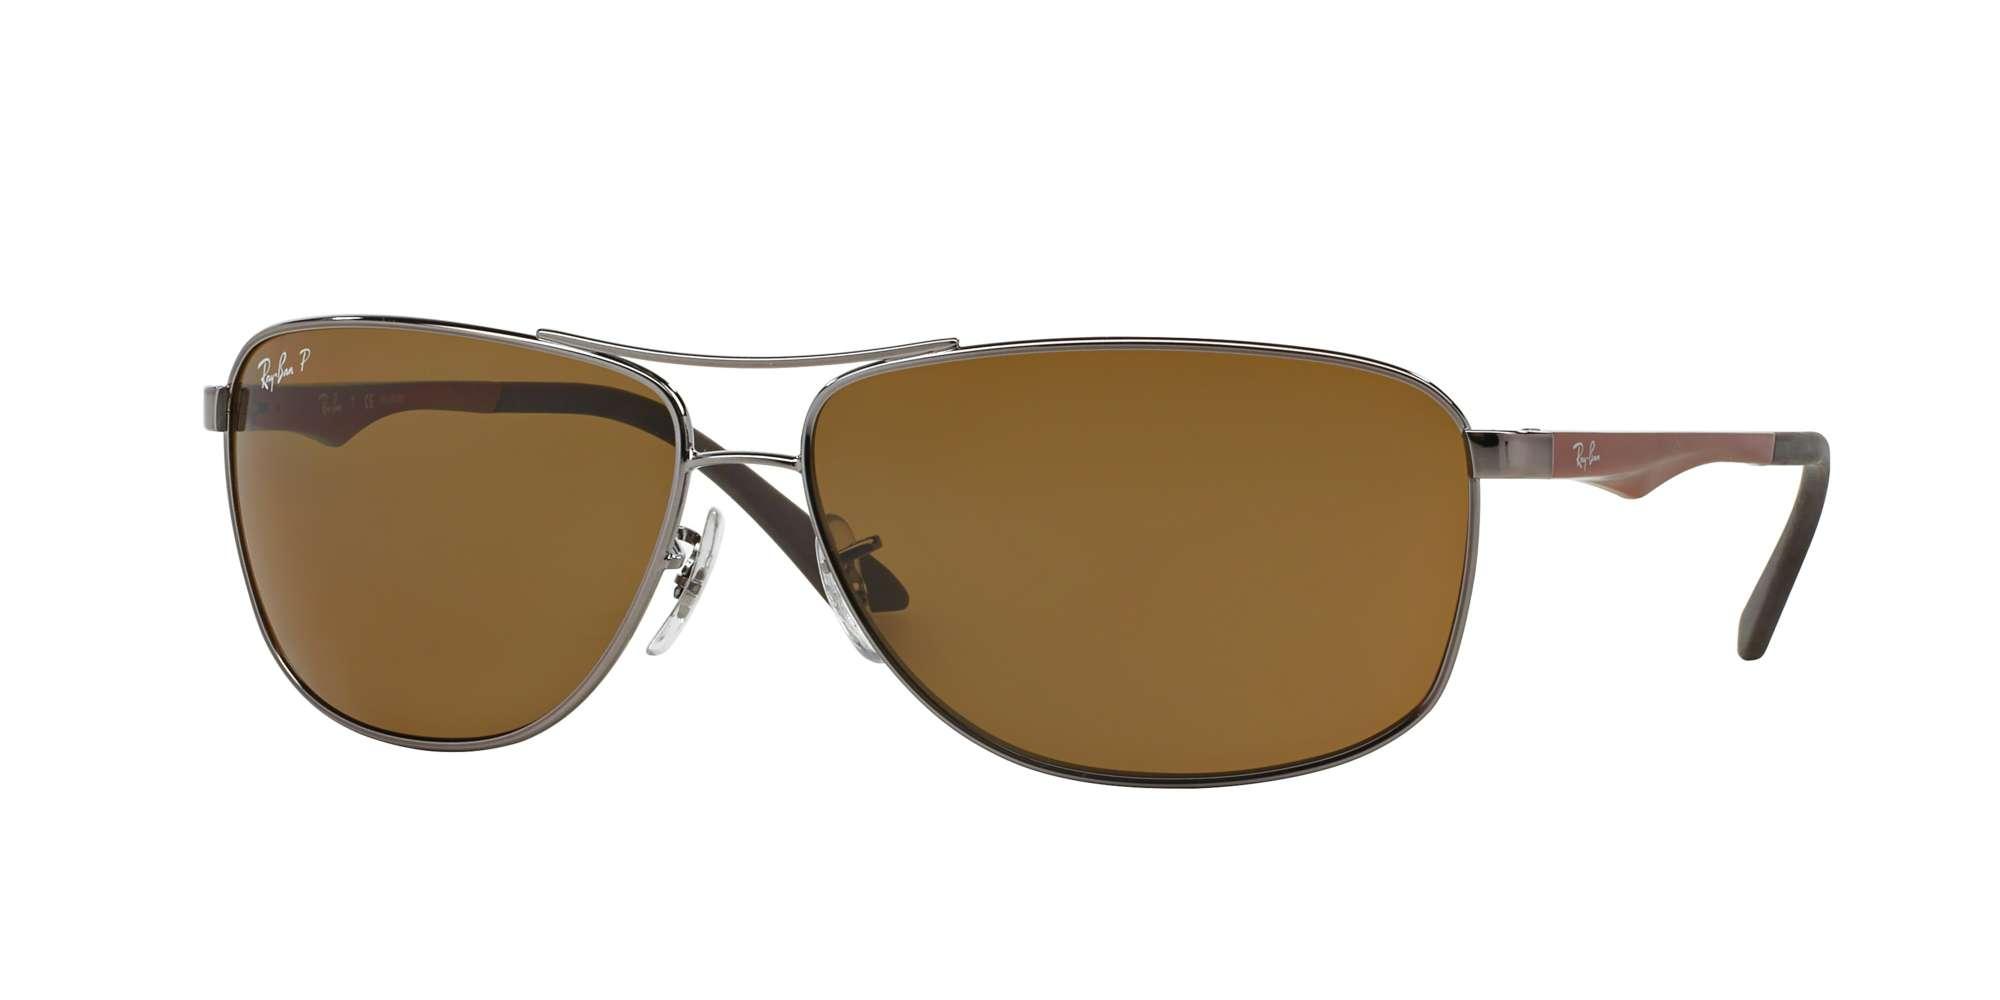 GUNMETAL / POLAR BROWN lenses